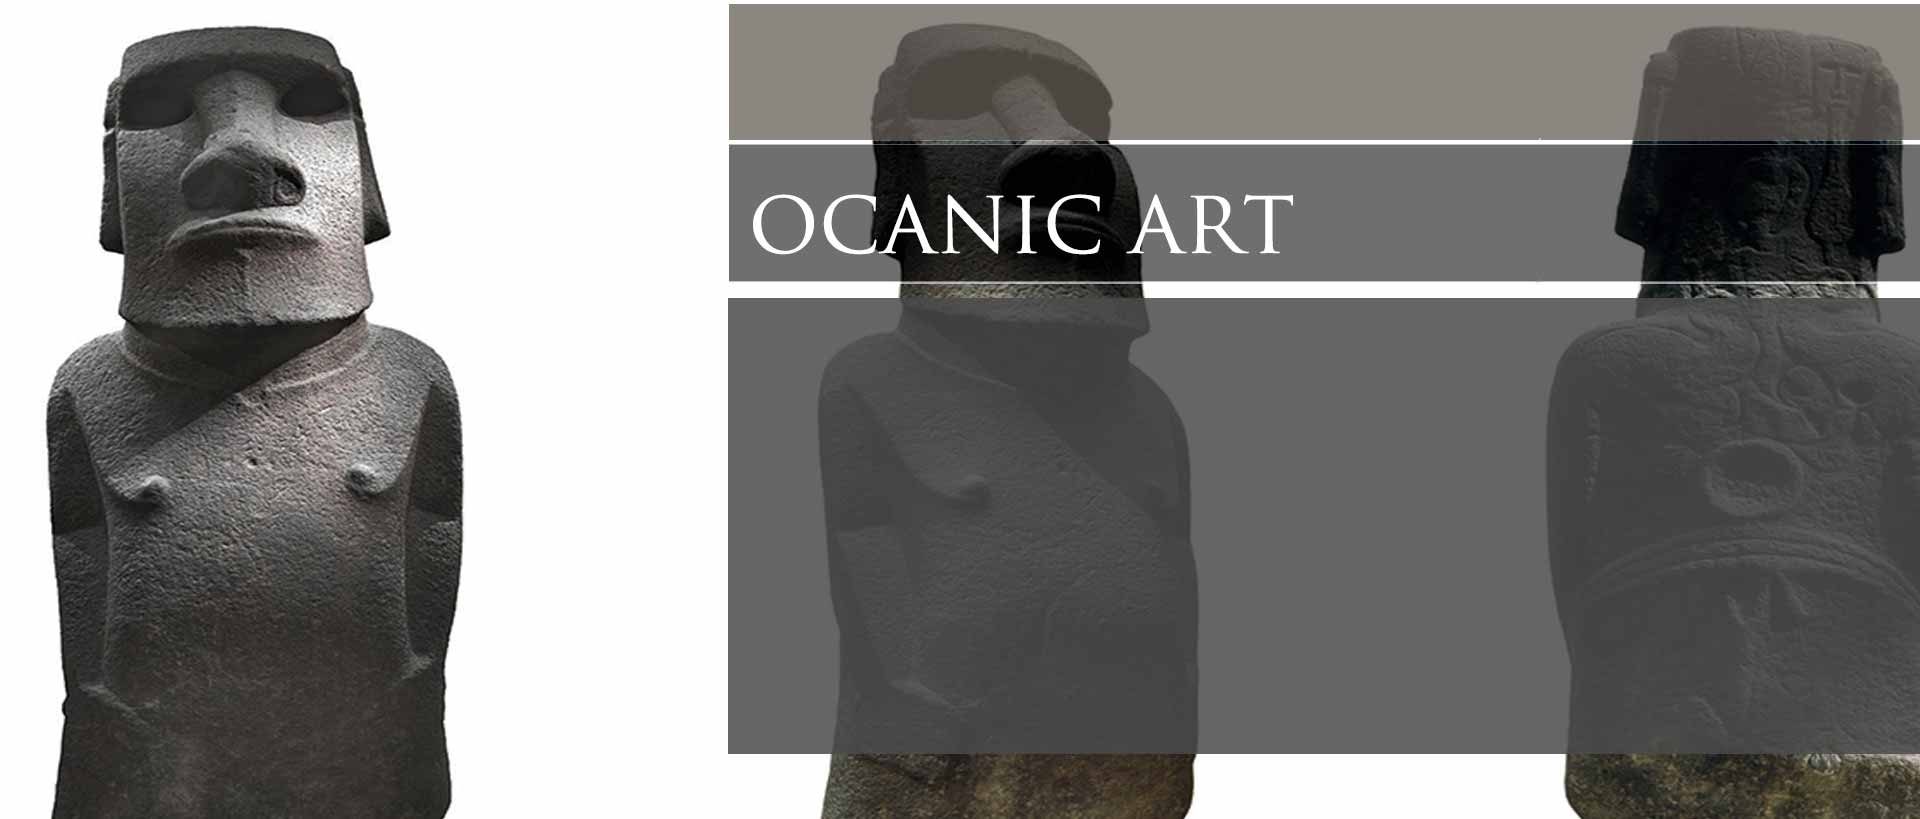 oghyanosi 1A 1 - مجسمه سازی در اقیانوسیه